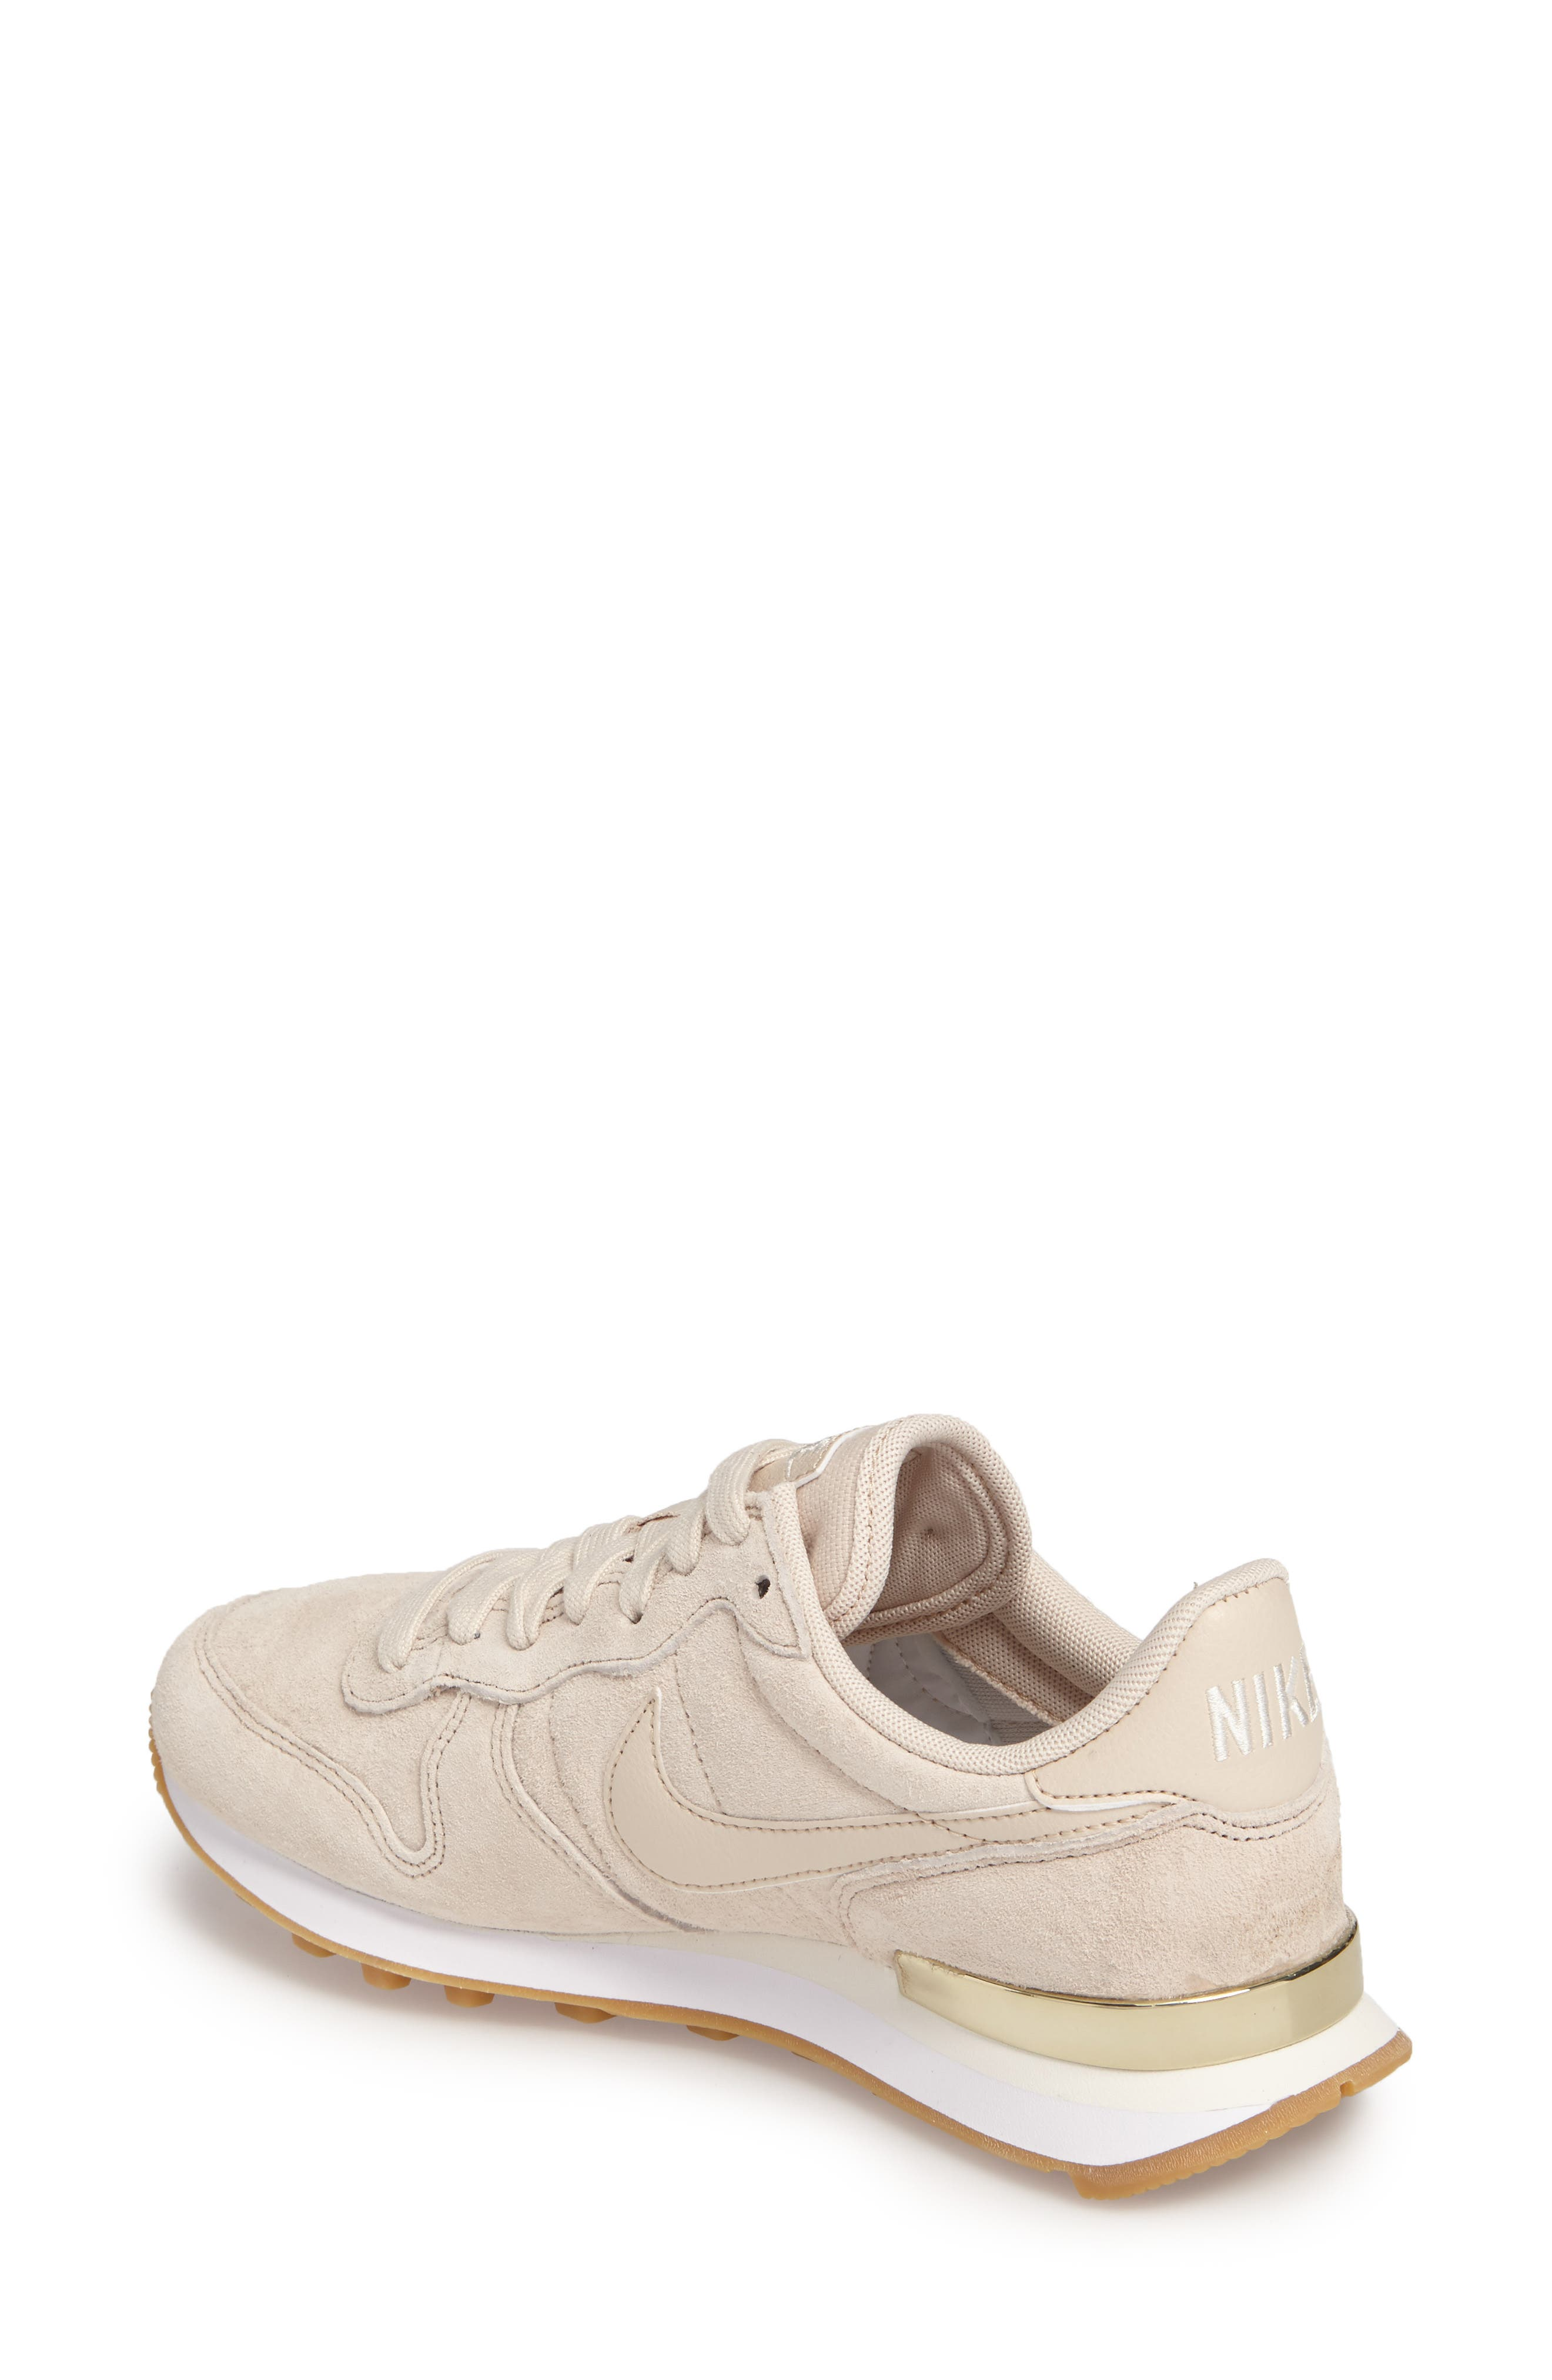 Alternate Image 2  - Nike Internationalist SD Sneaker (Women)